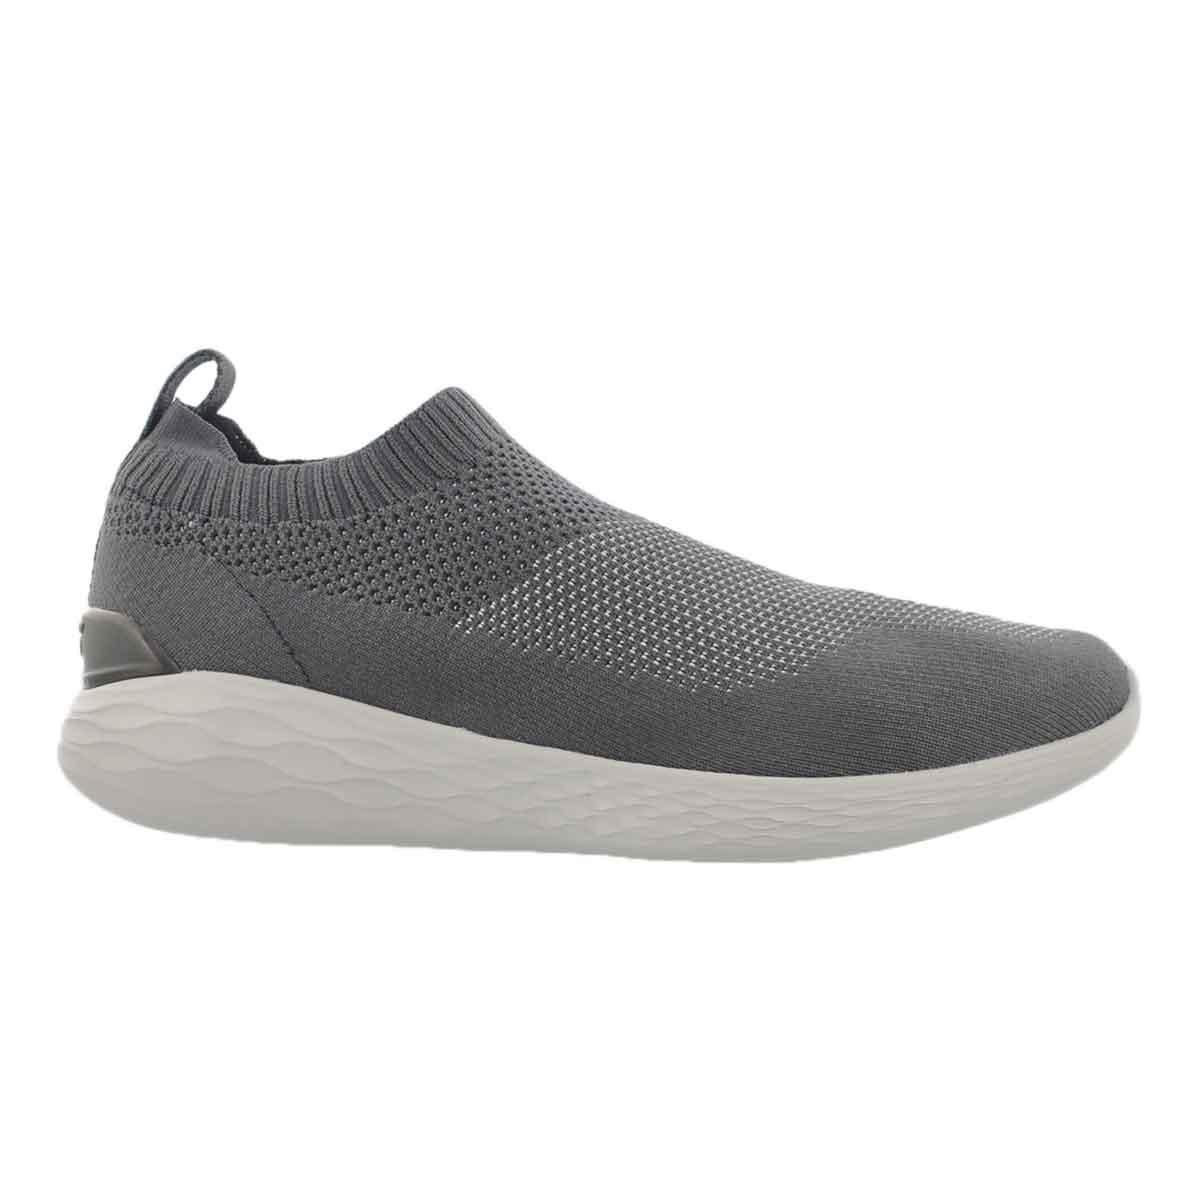 Mns GO Strike charcoal slip on shoe